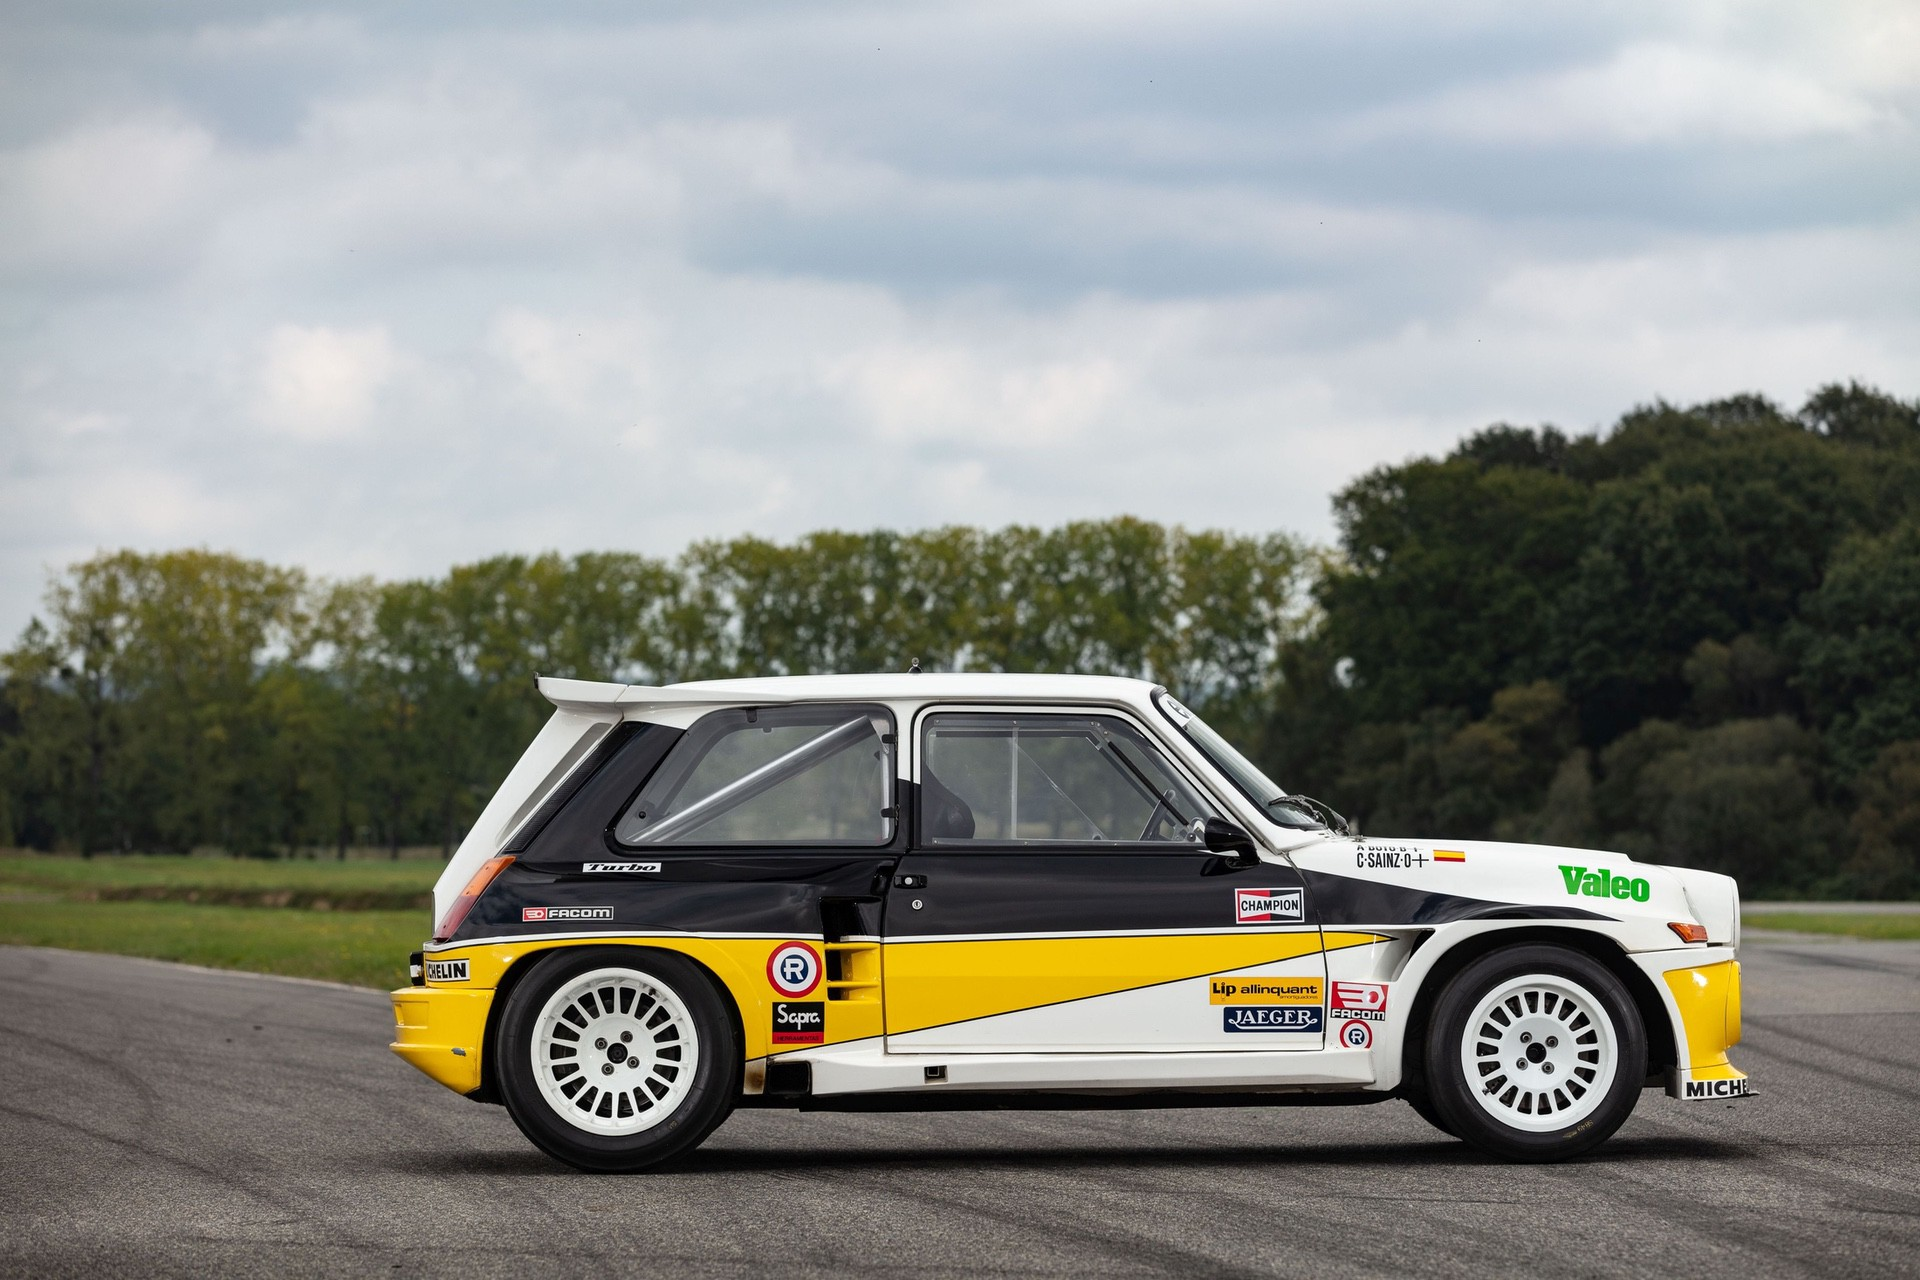 Renault_R5_Maxi_Turbo_ex-Carlos_Sainz-0003